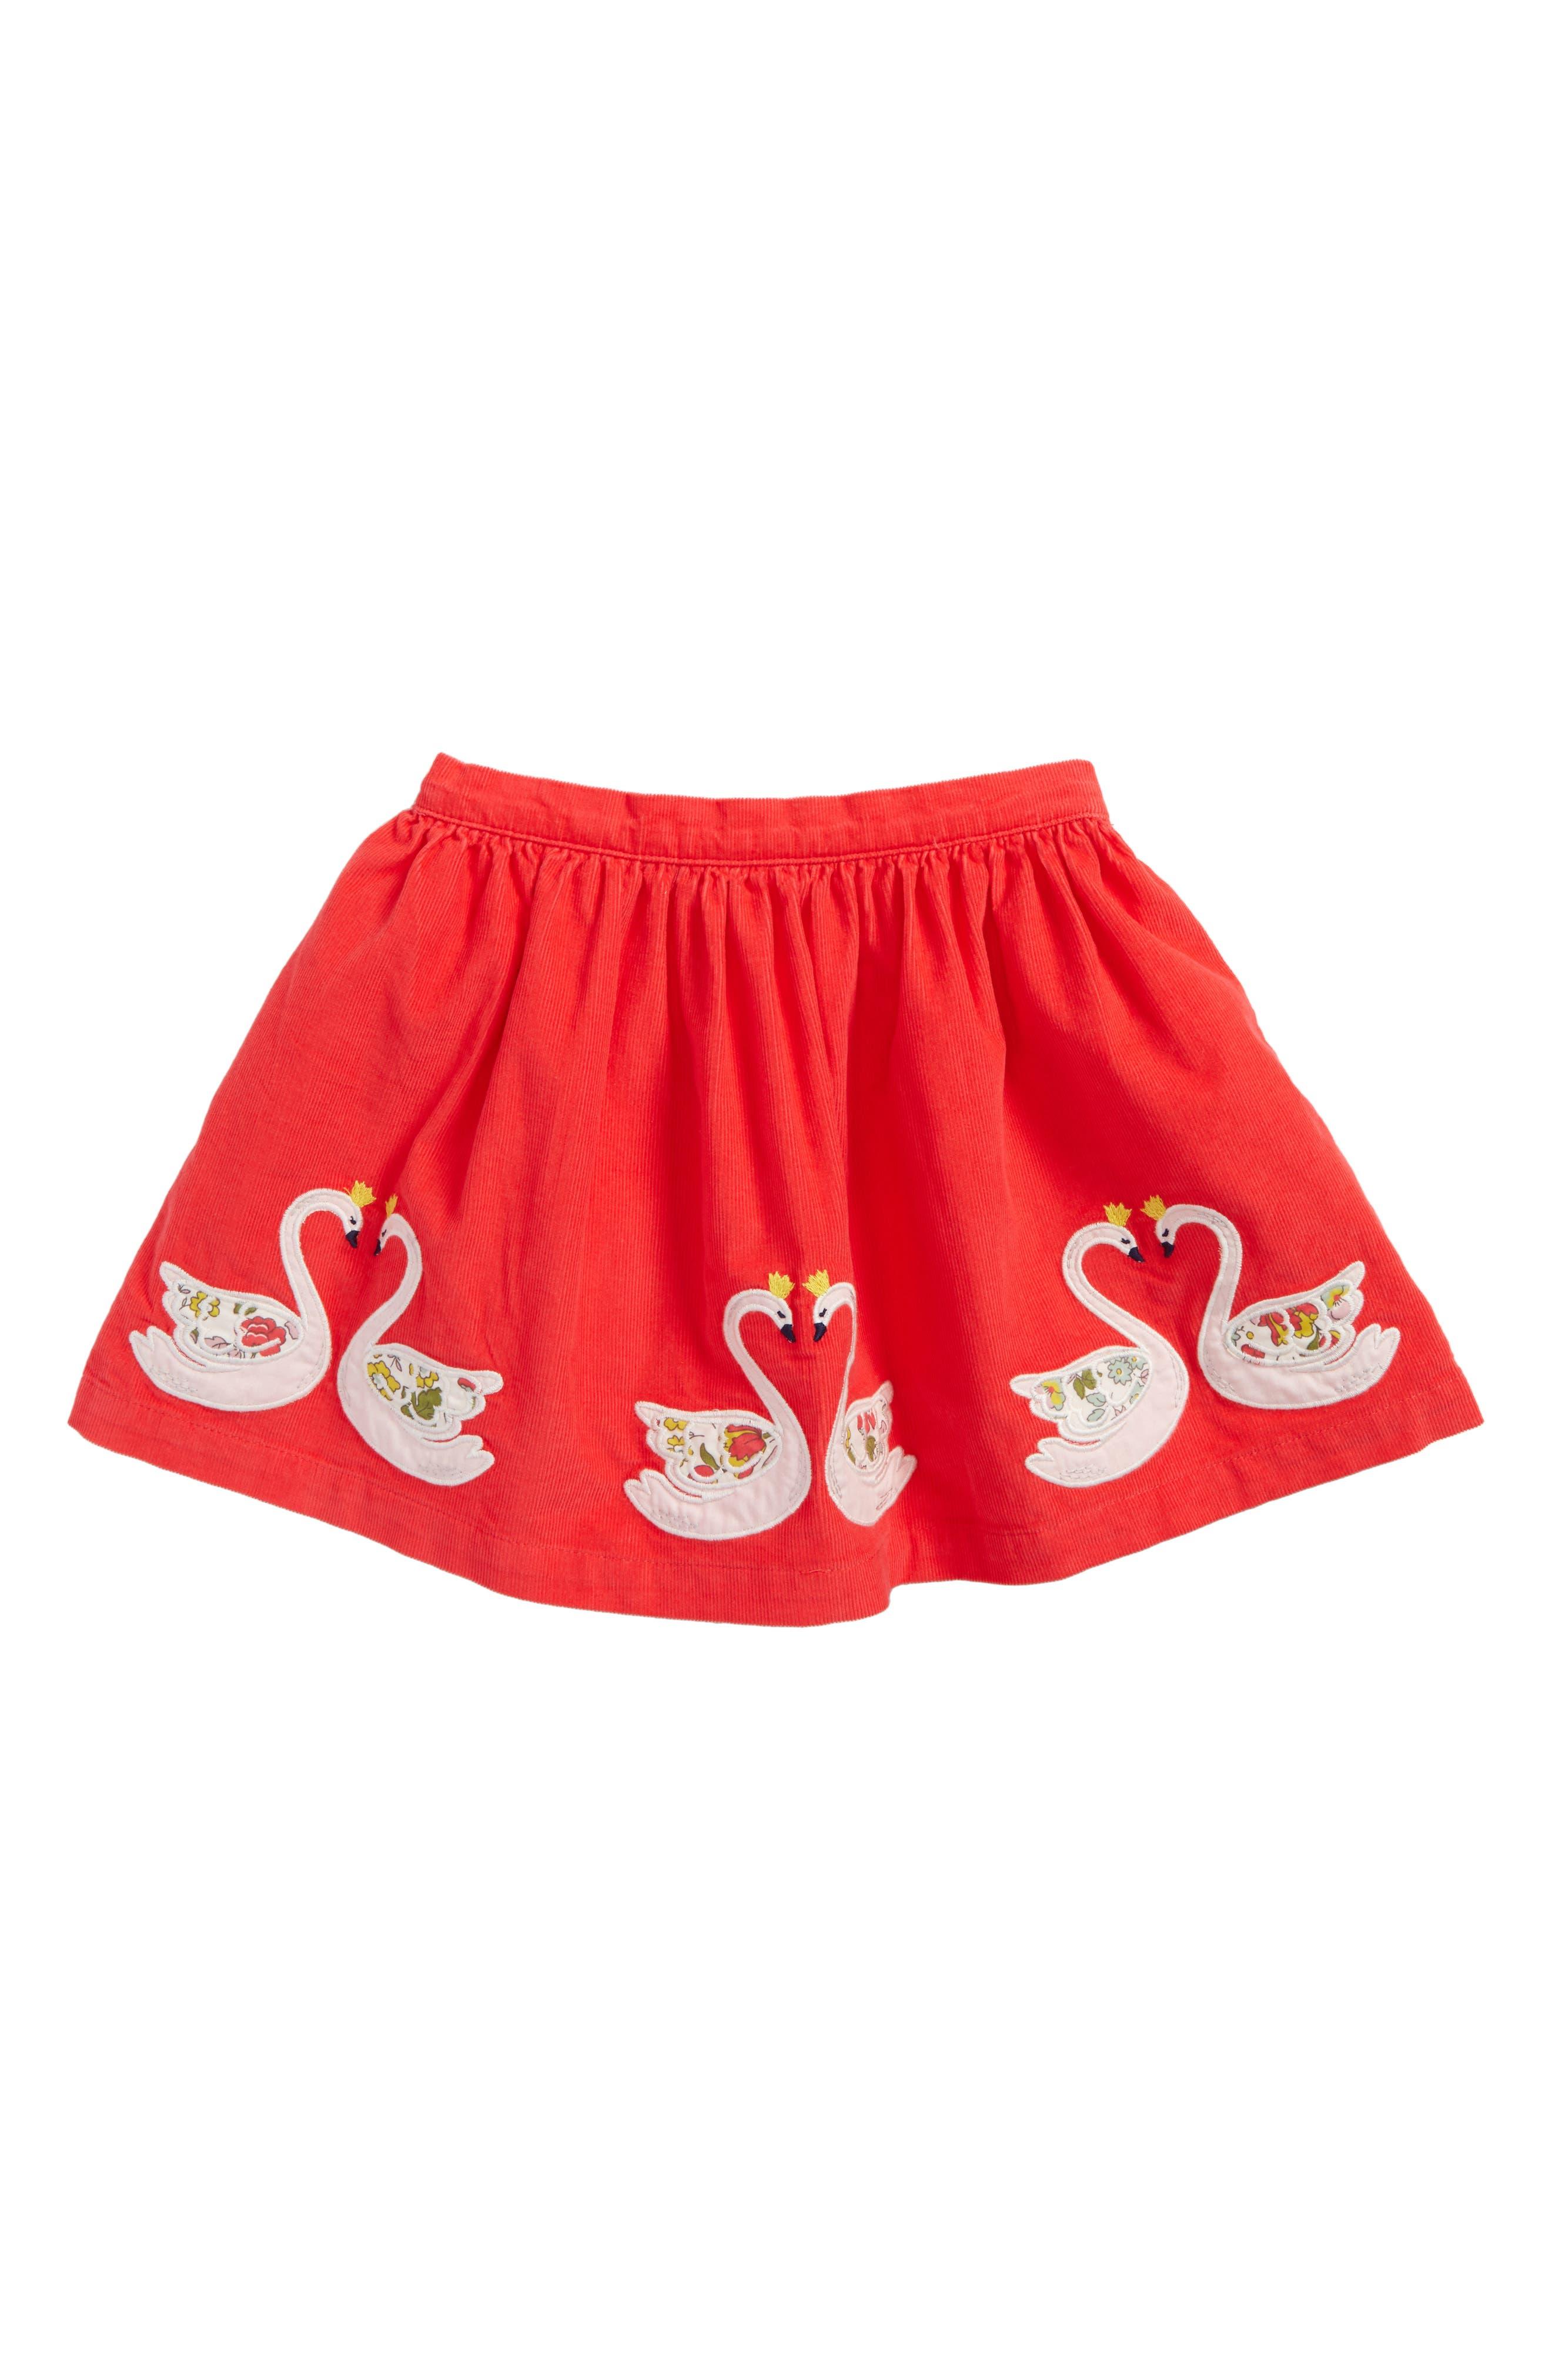 Main Image - Mini Boden Fairytale Appliqué Corduroy Skirt (Toddler Girls, Little Girls & Big Girls)